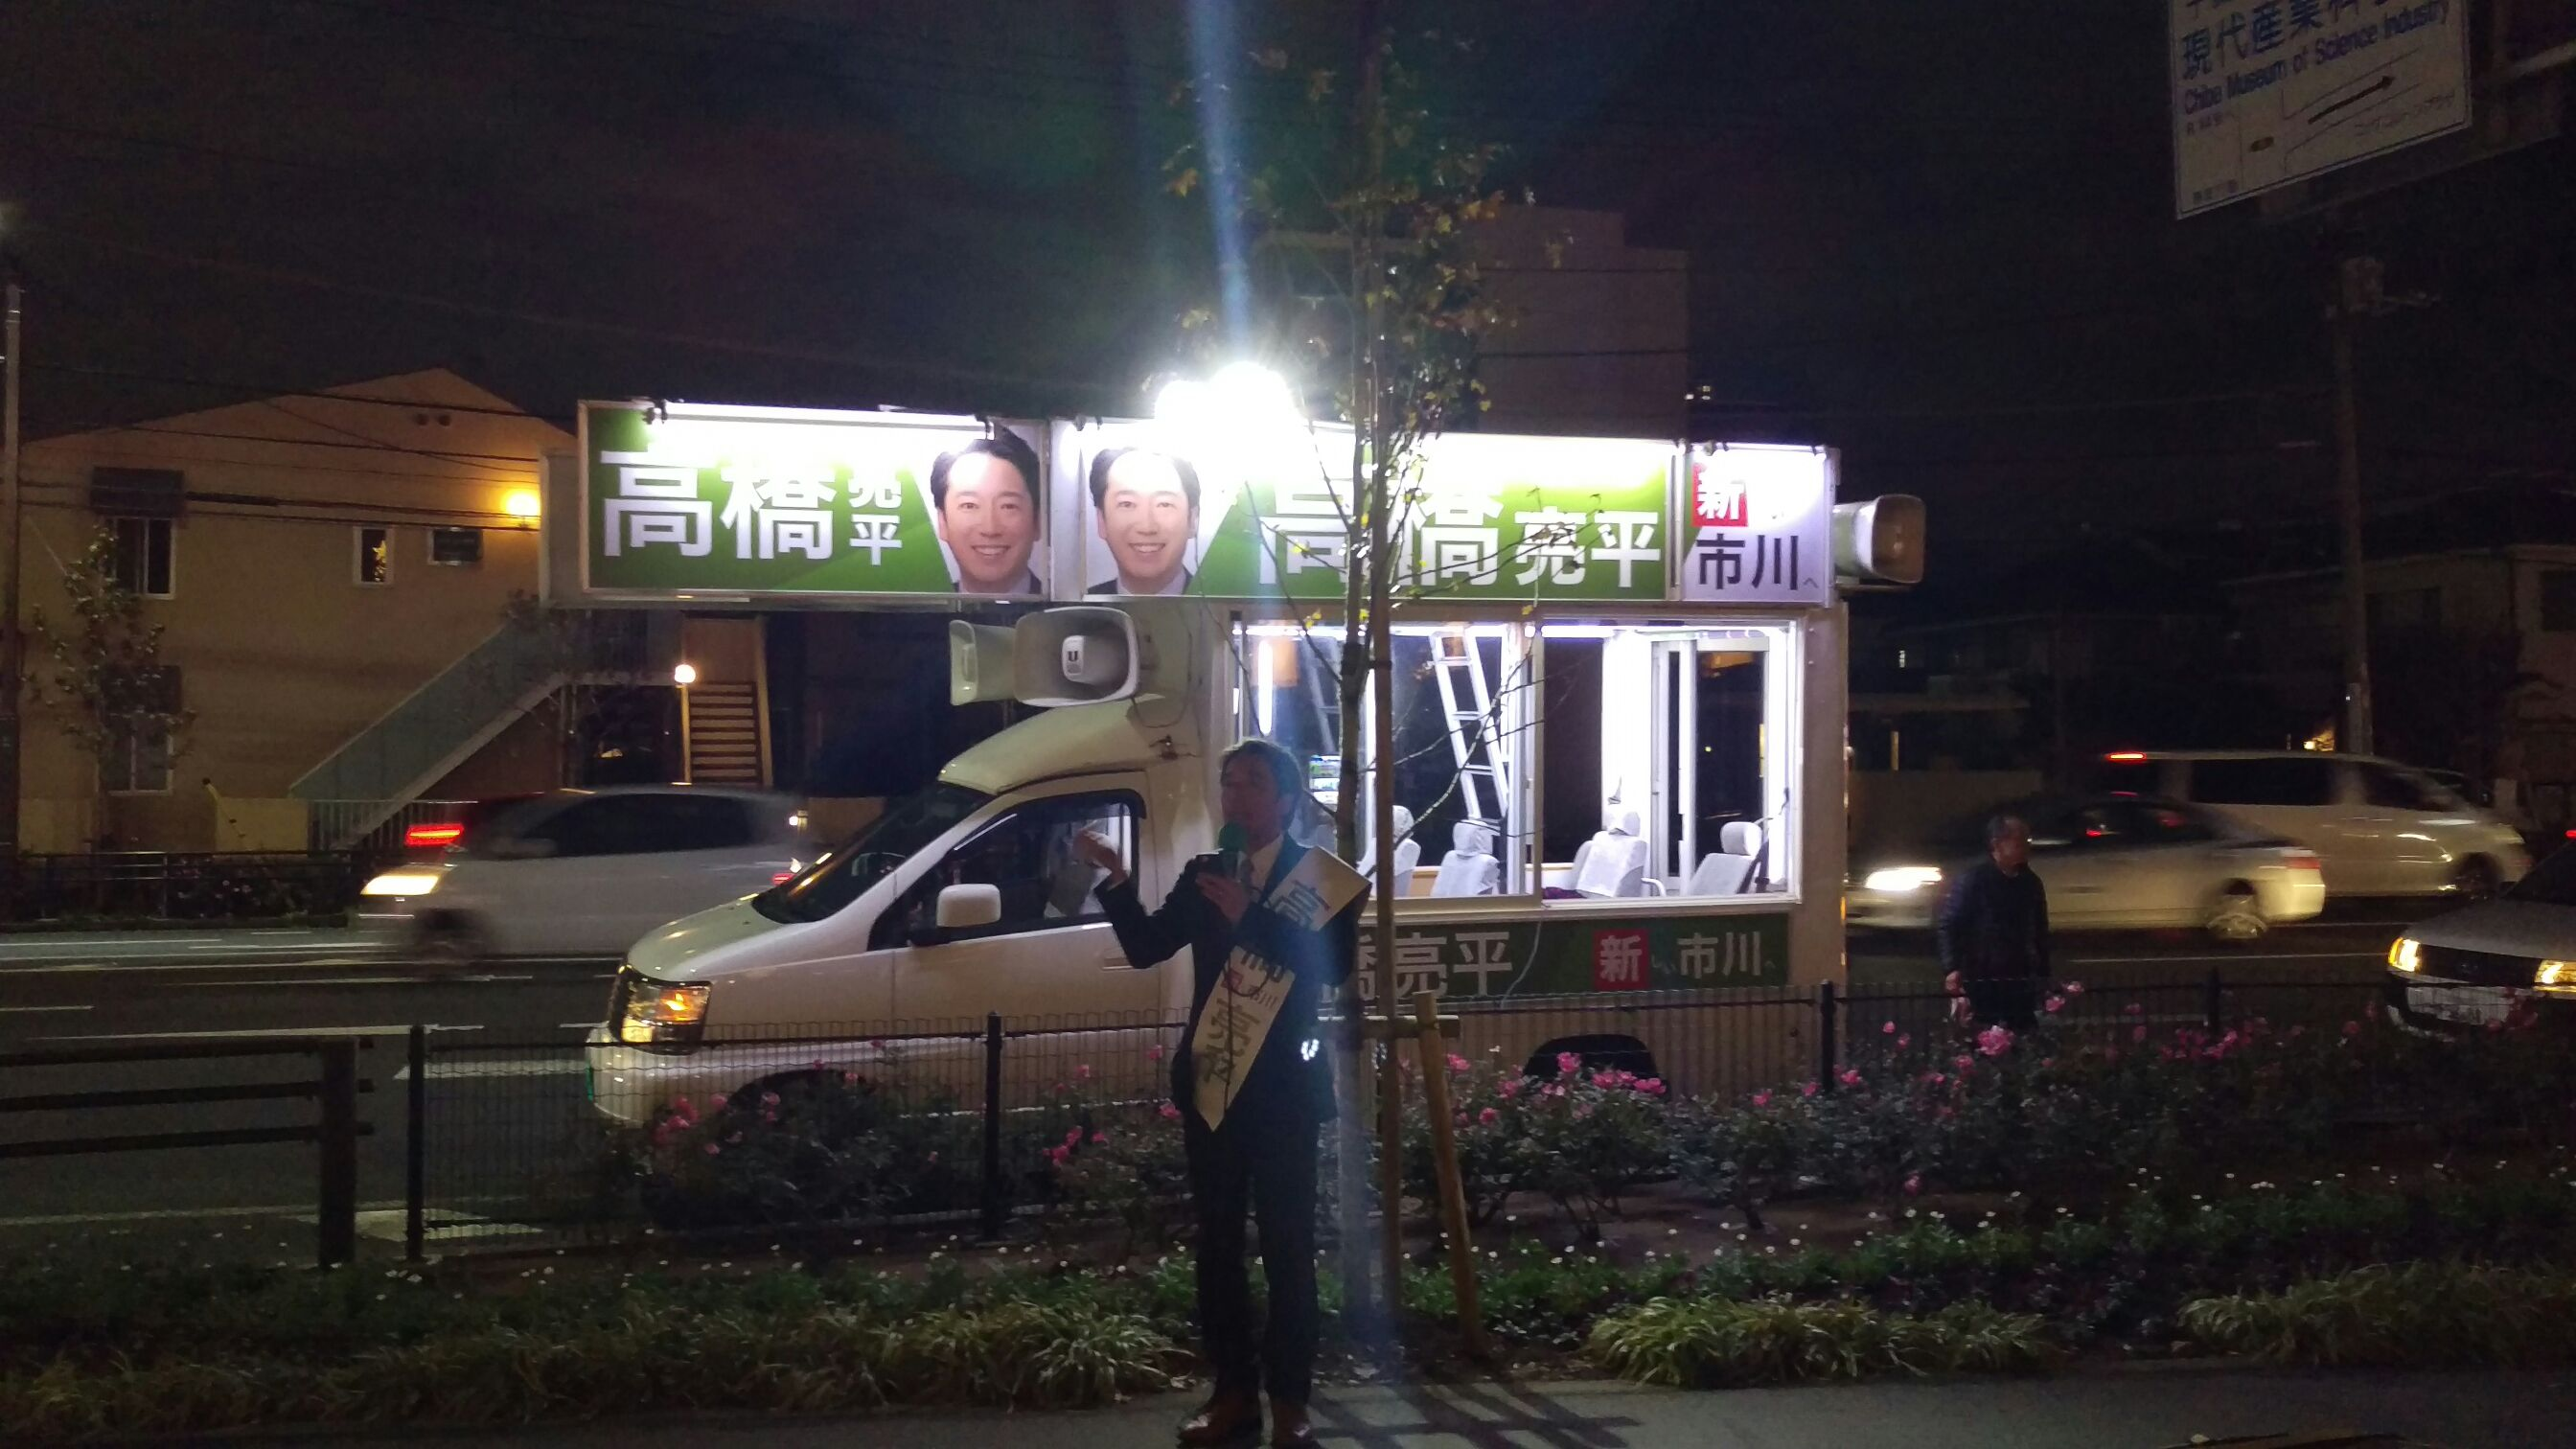 市川市長候補高橋亮平君の応援に